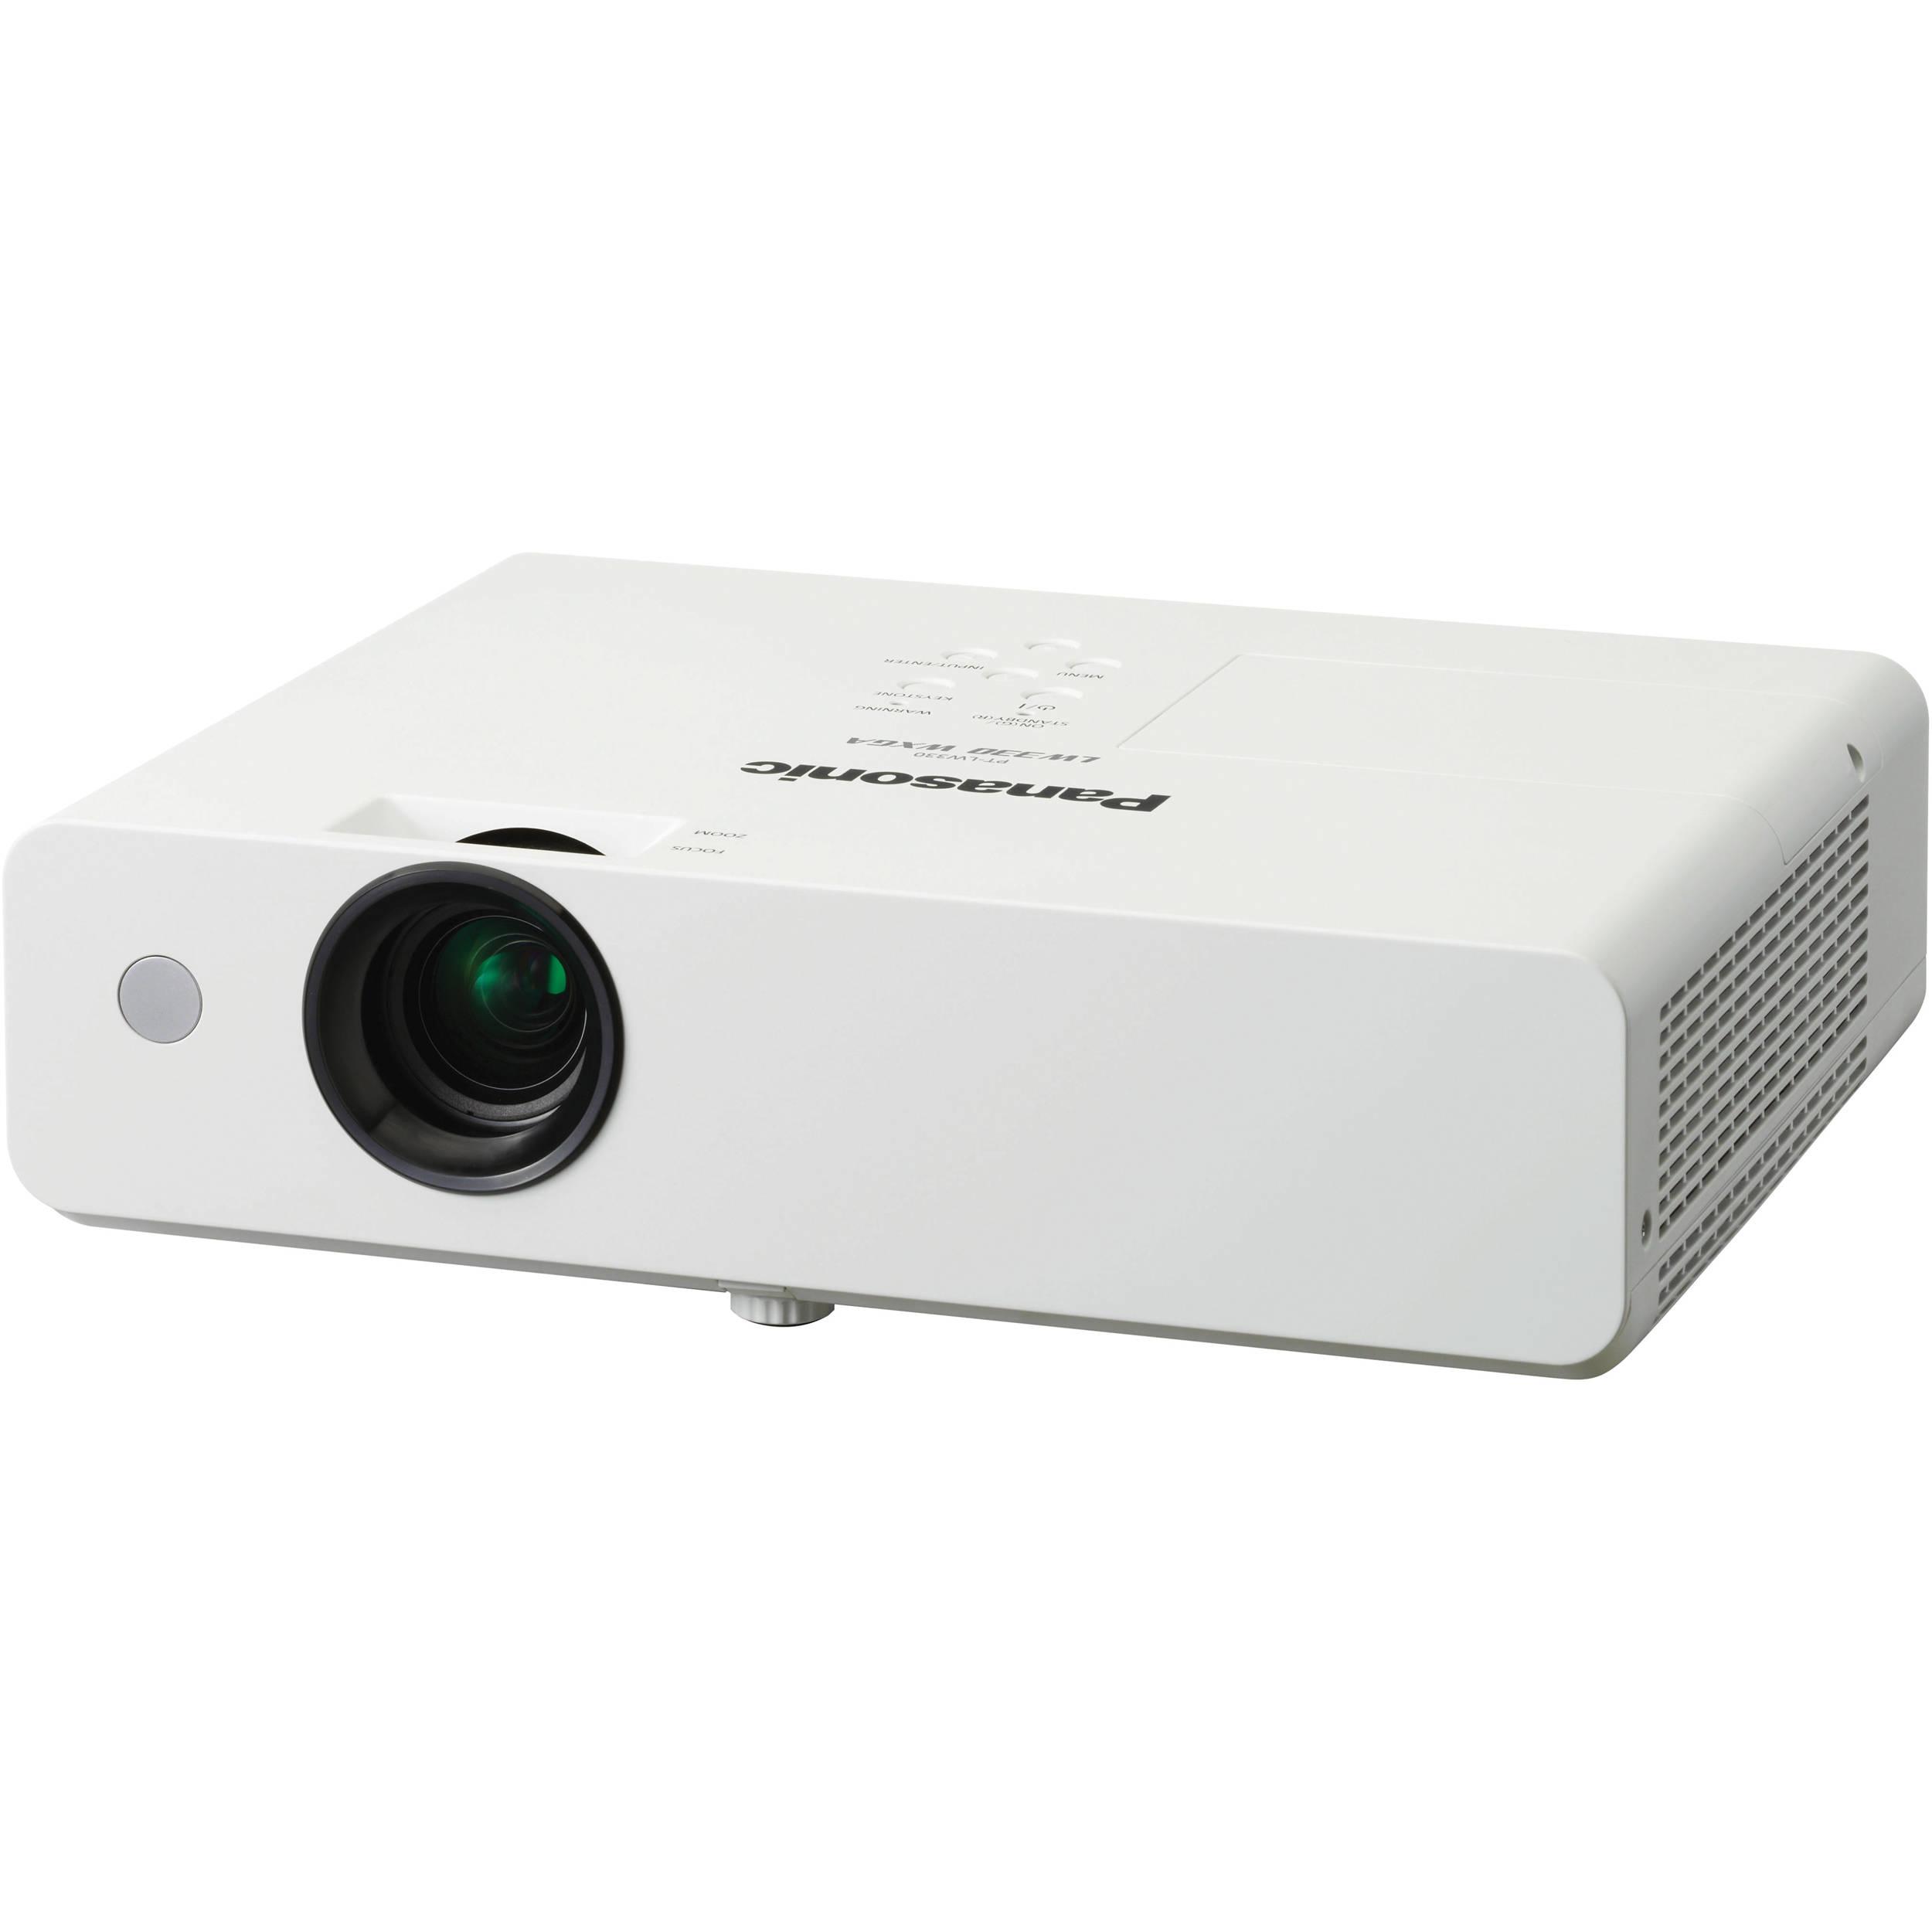 PT-LW330 Panasonic Projector